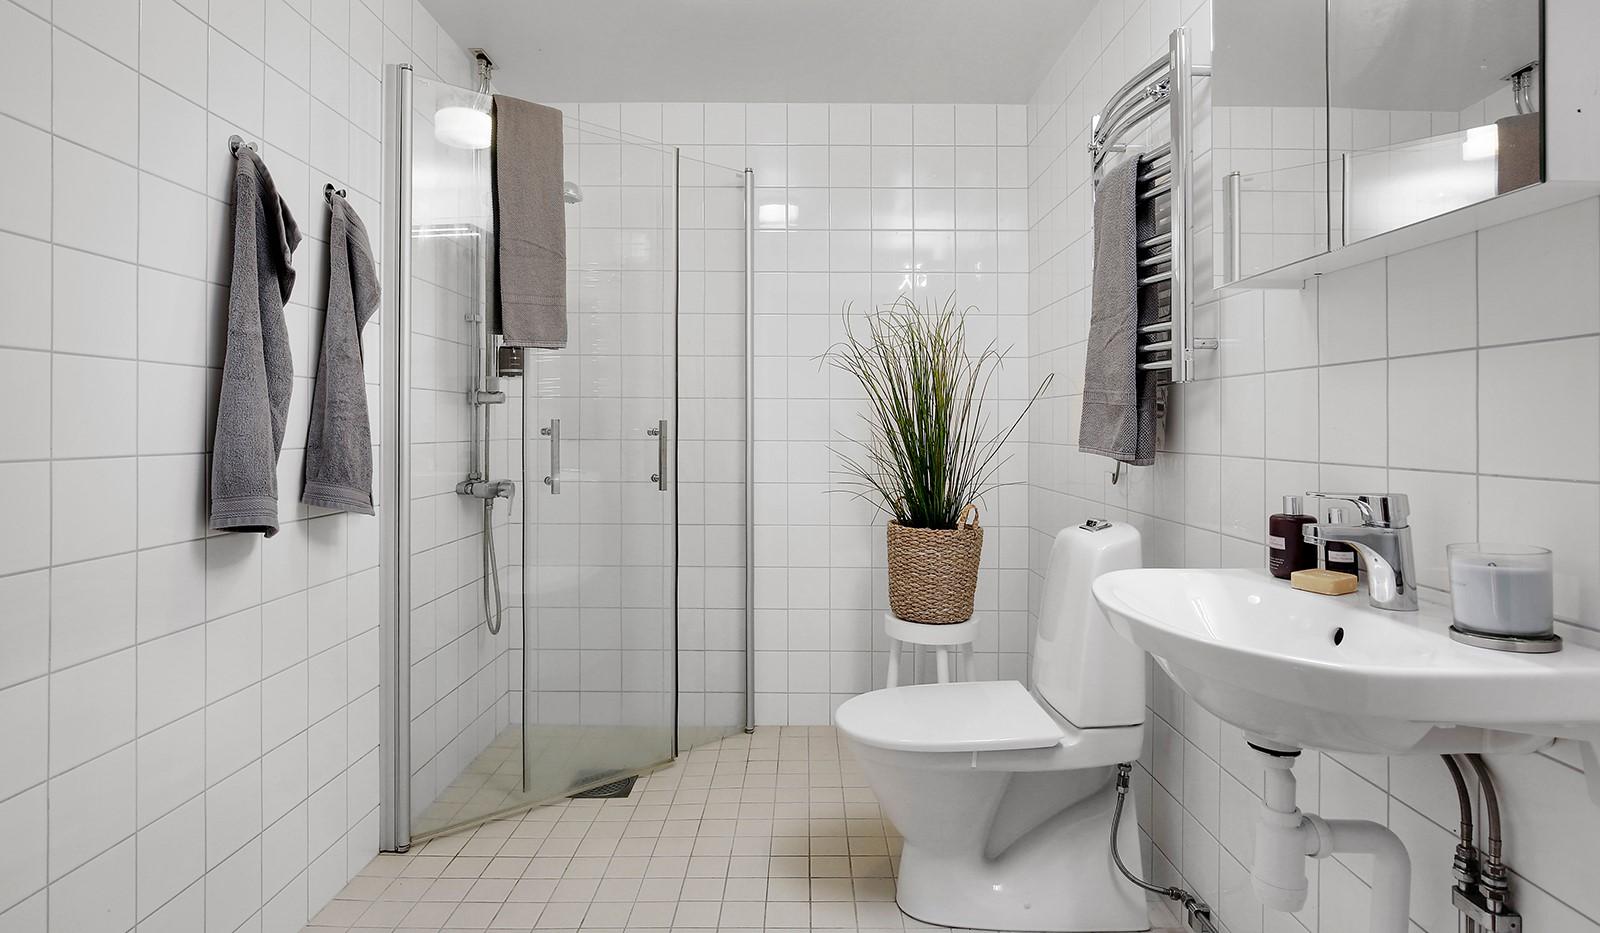 Hornsgatan 37, 1 tr - Nytt badrum i samband med stambyte år 2015-2016